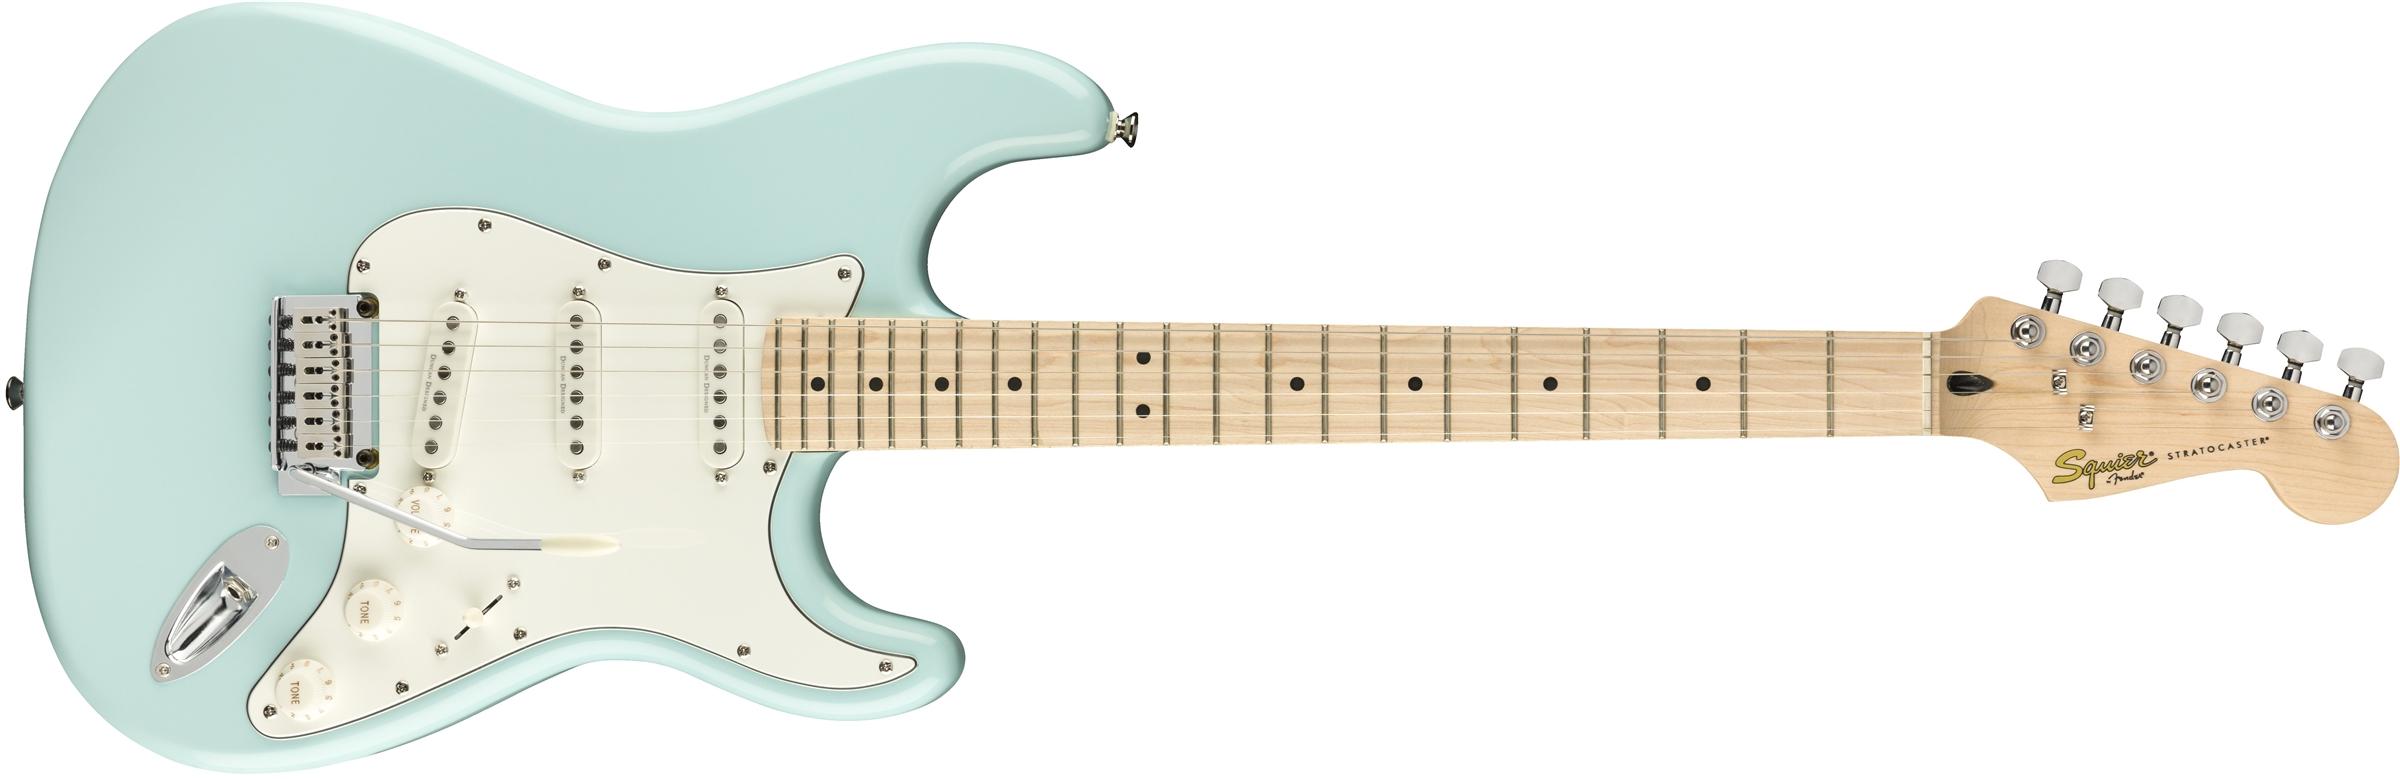 squier deluxe stratocaster maple fingerboard daphne blue squier electric guitars. Black Bedroom Furniture Sets. Home Design Ideas